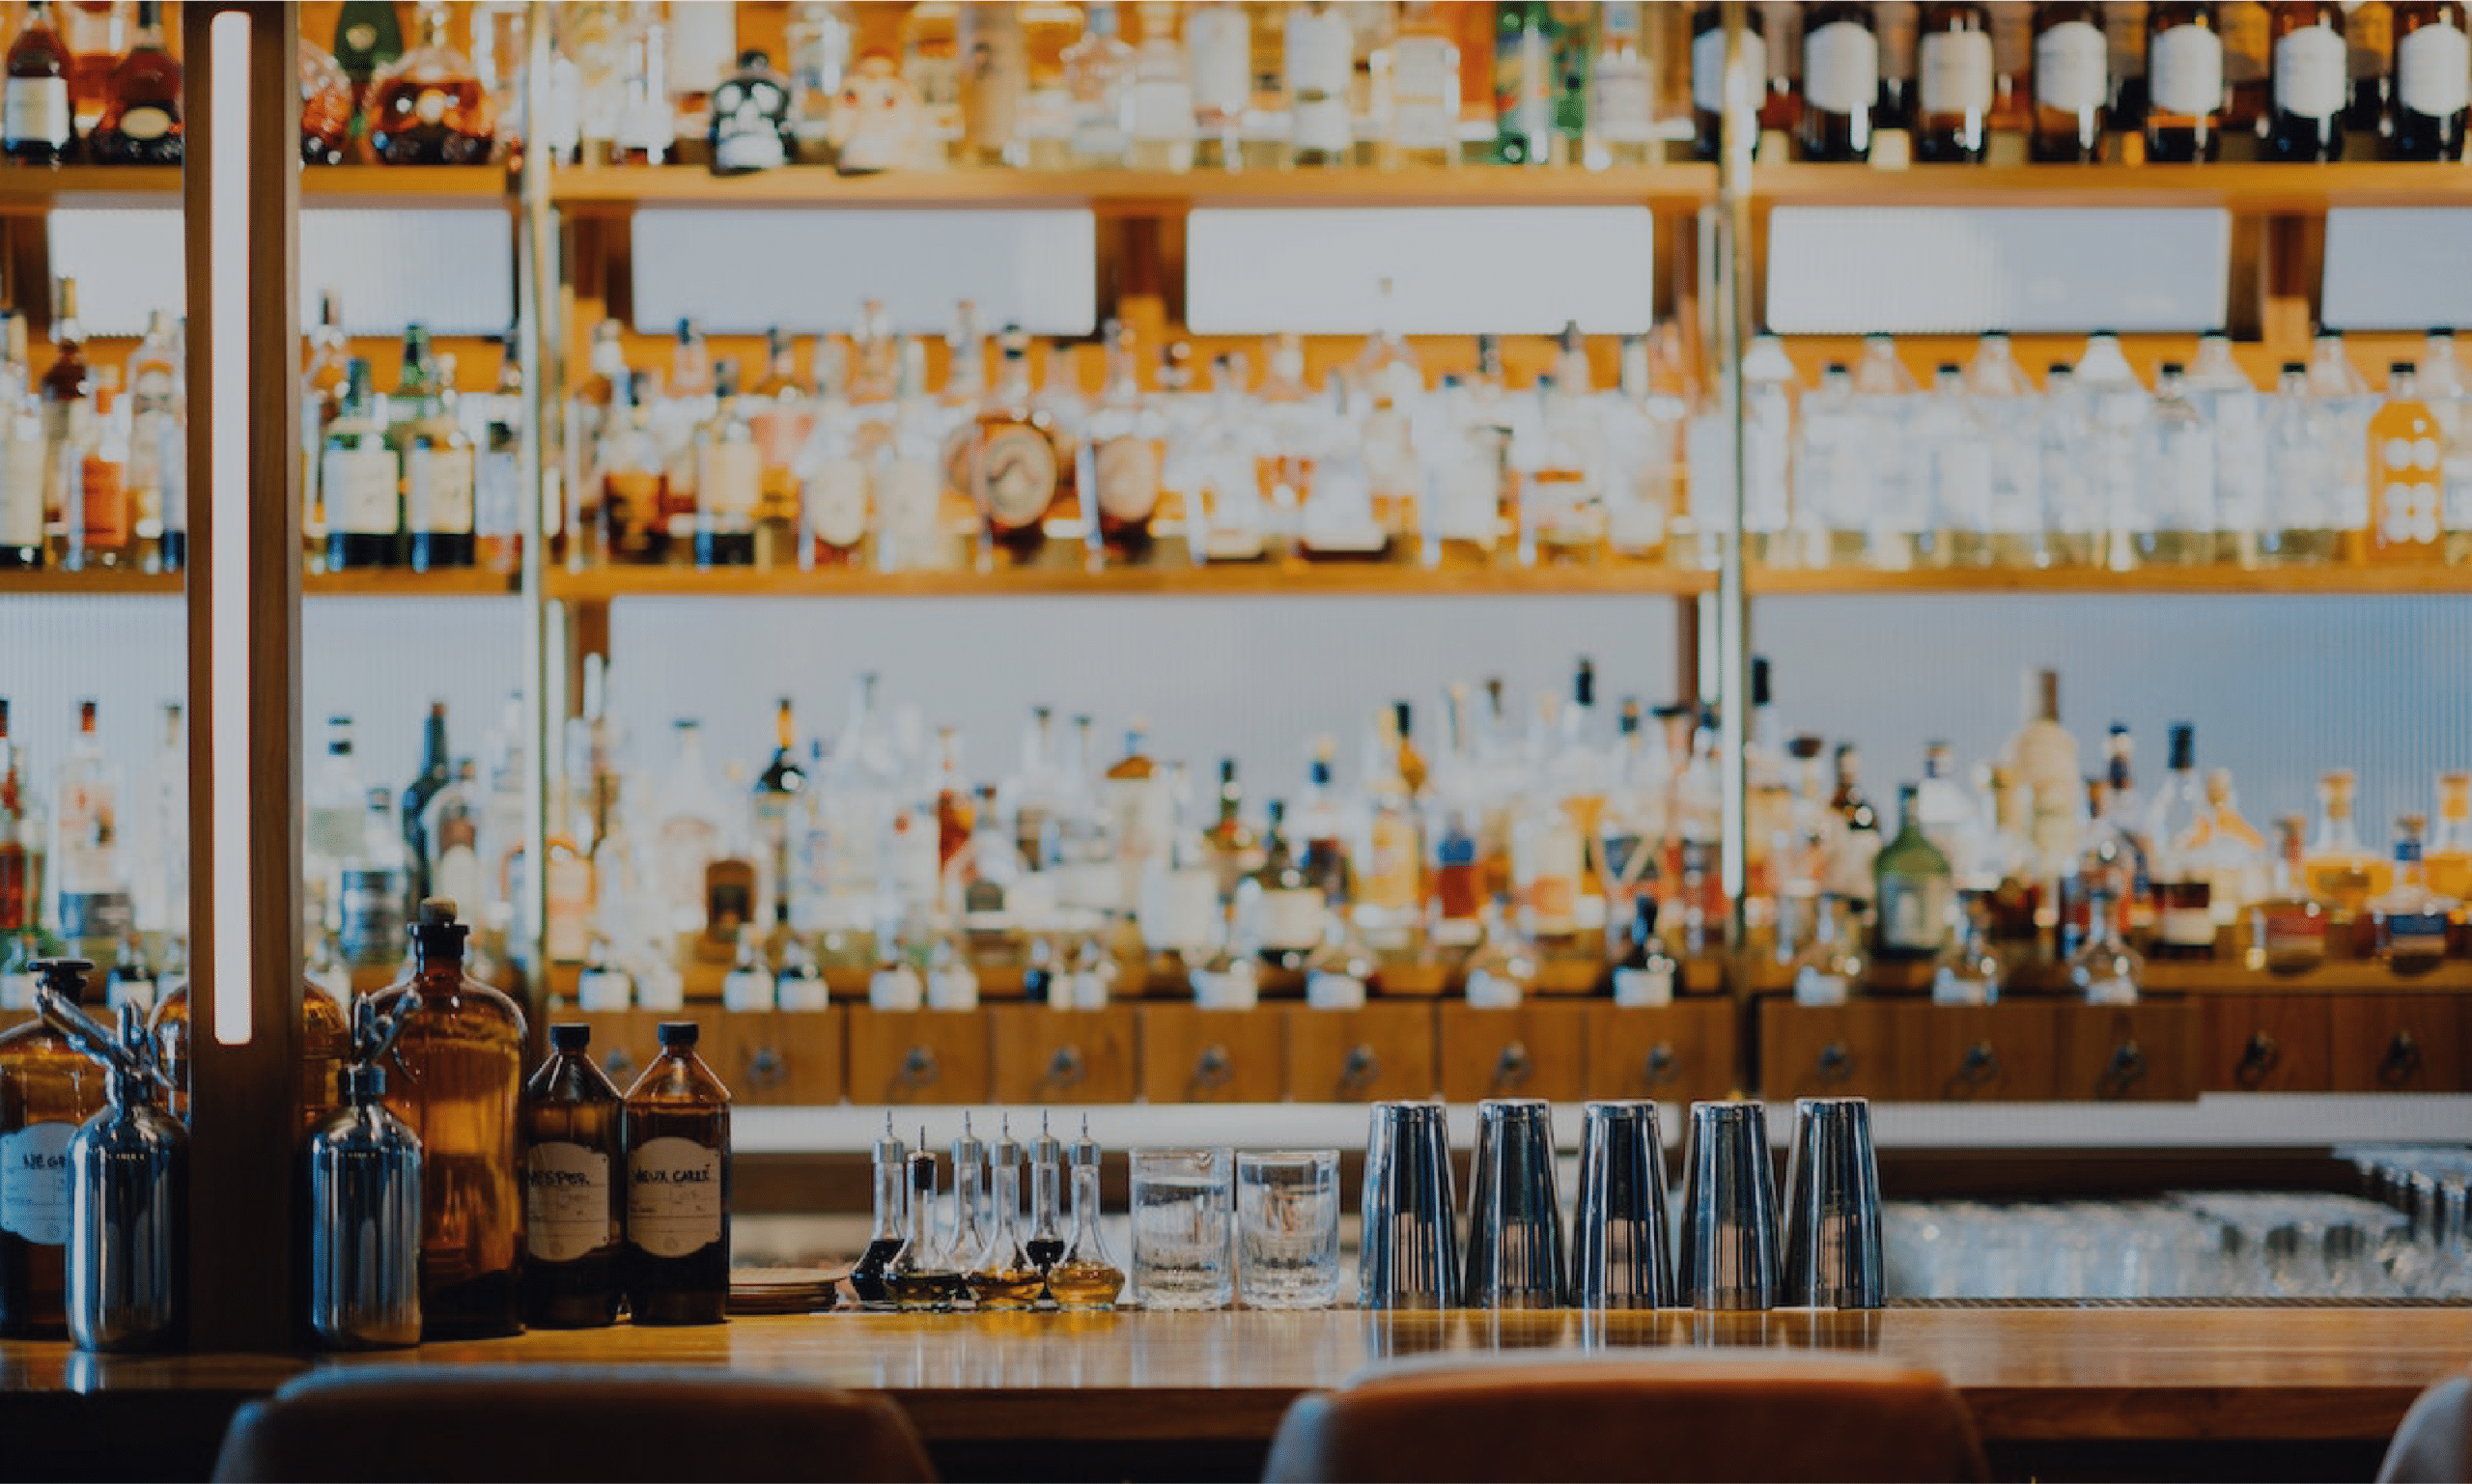 Bar and liquor bottles at a dram shop